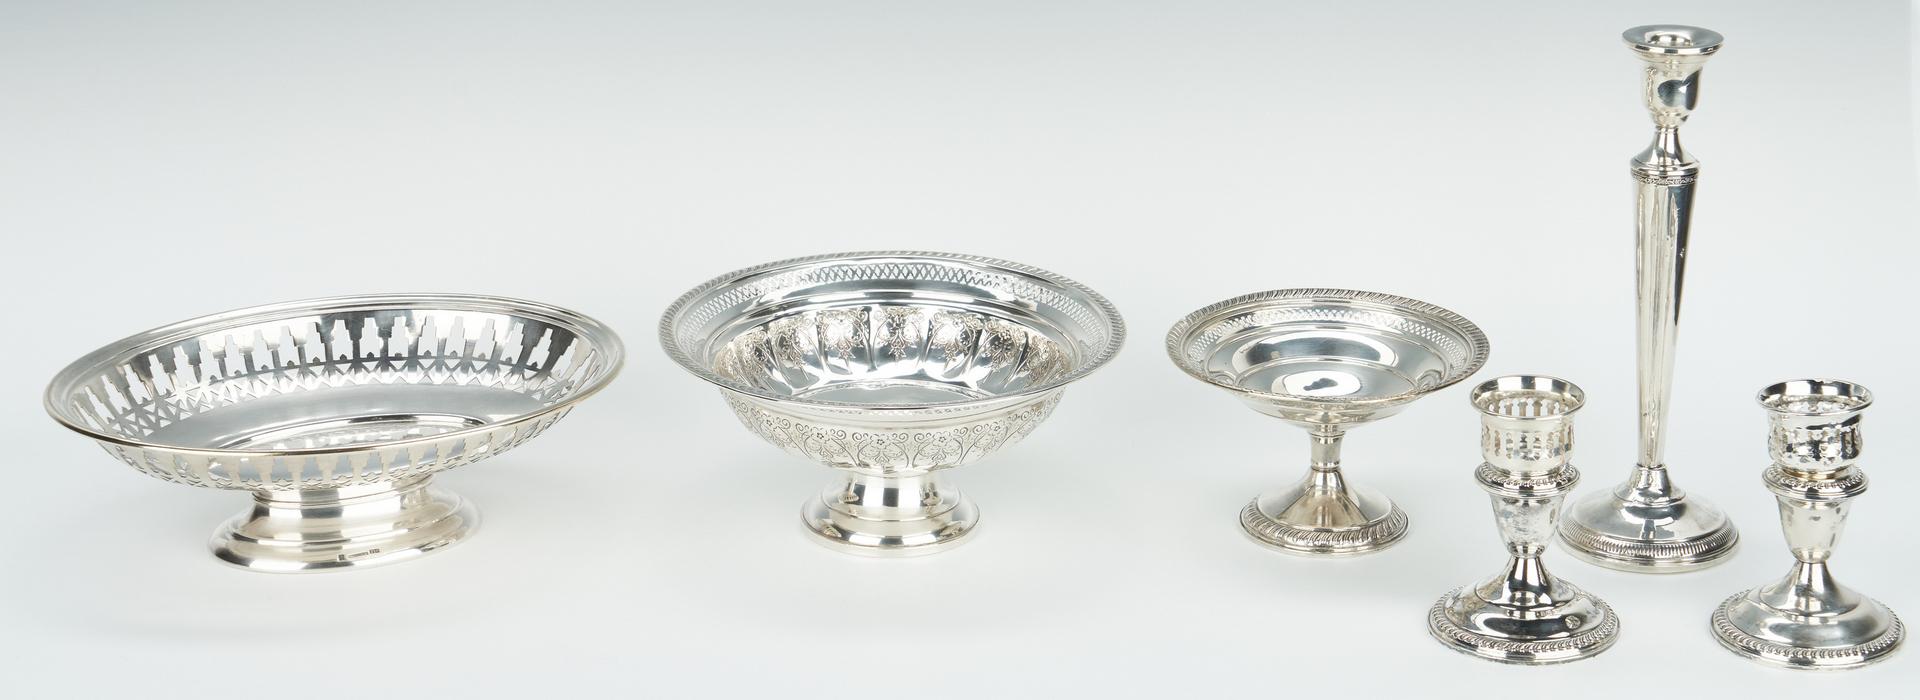 Lot 945: 6 Hollowware Items, incl. Christofle Bowl